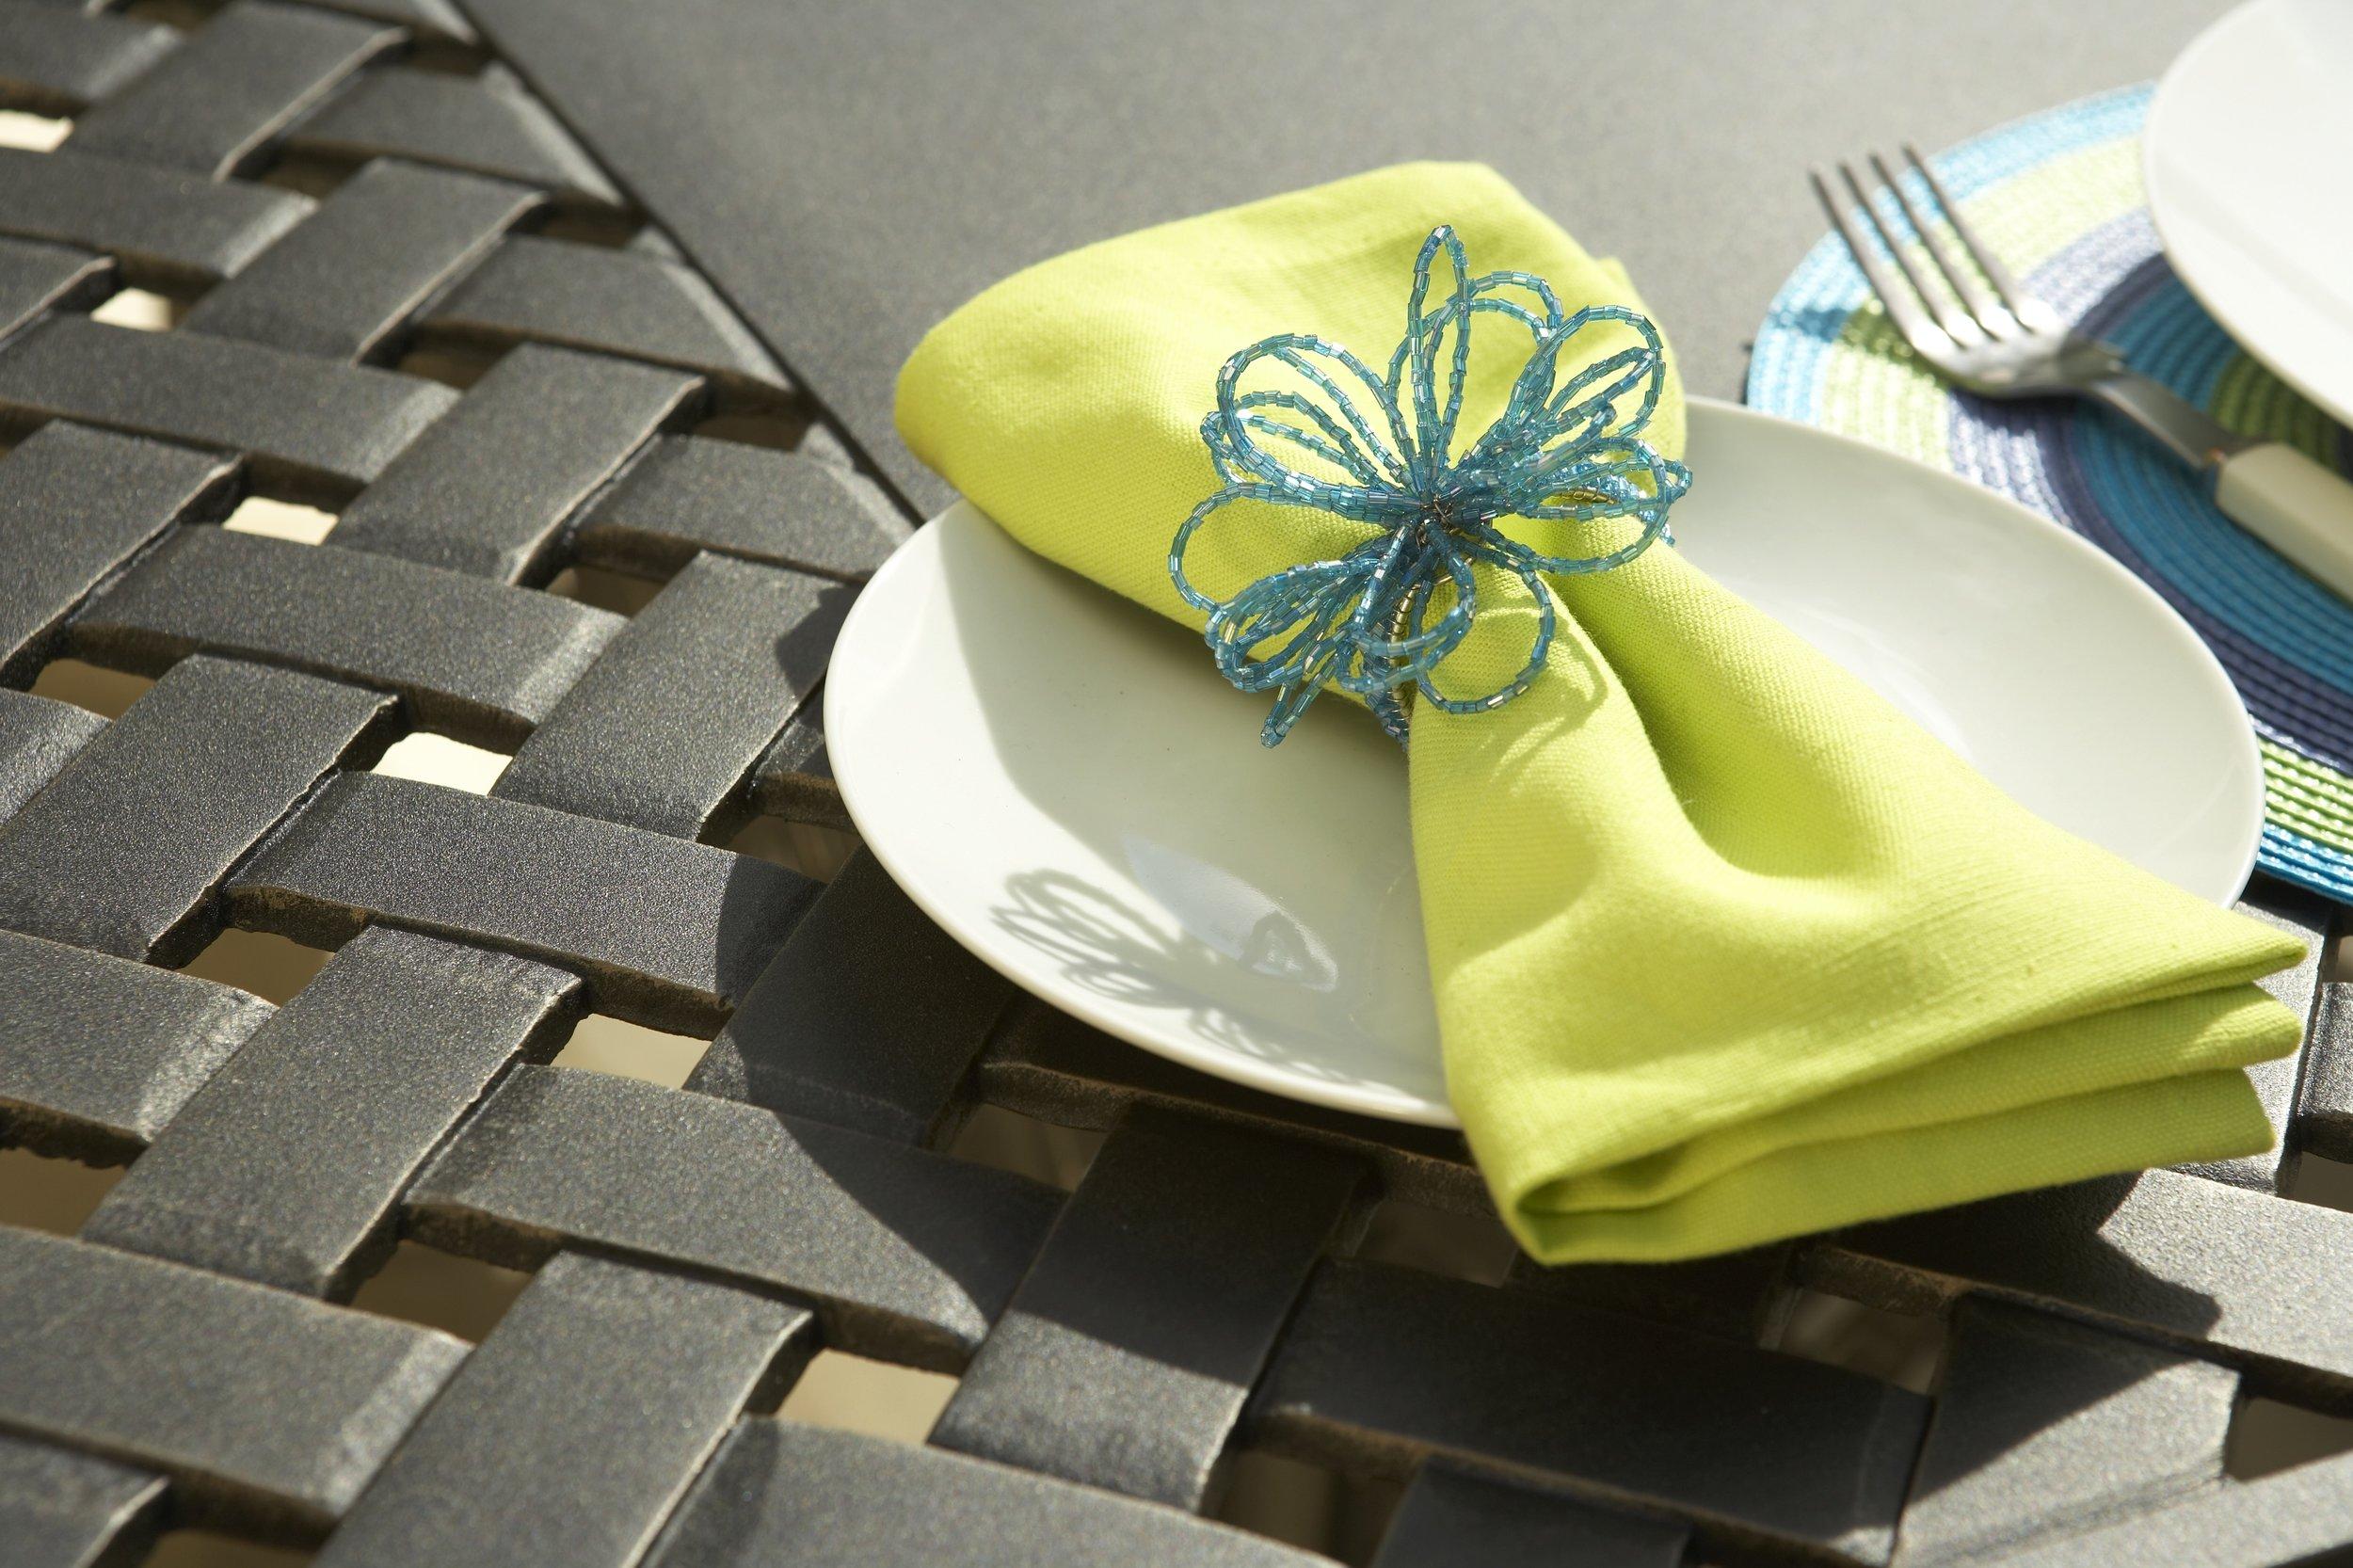 Verona table top design